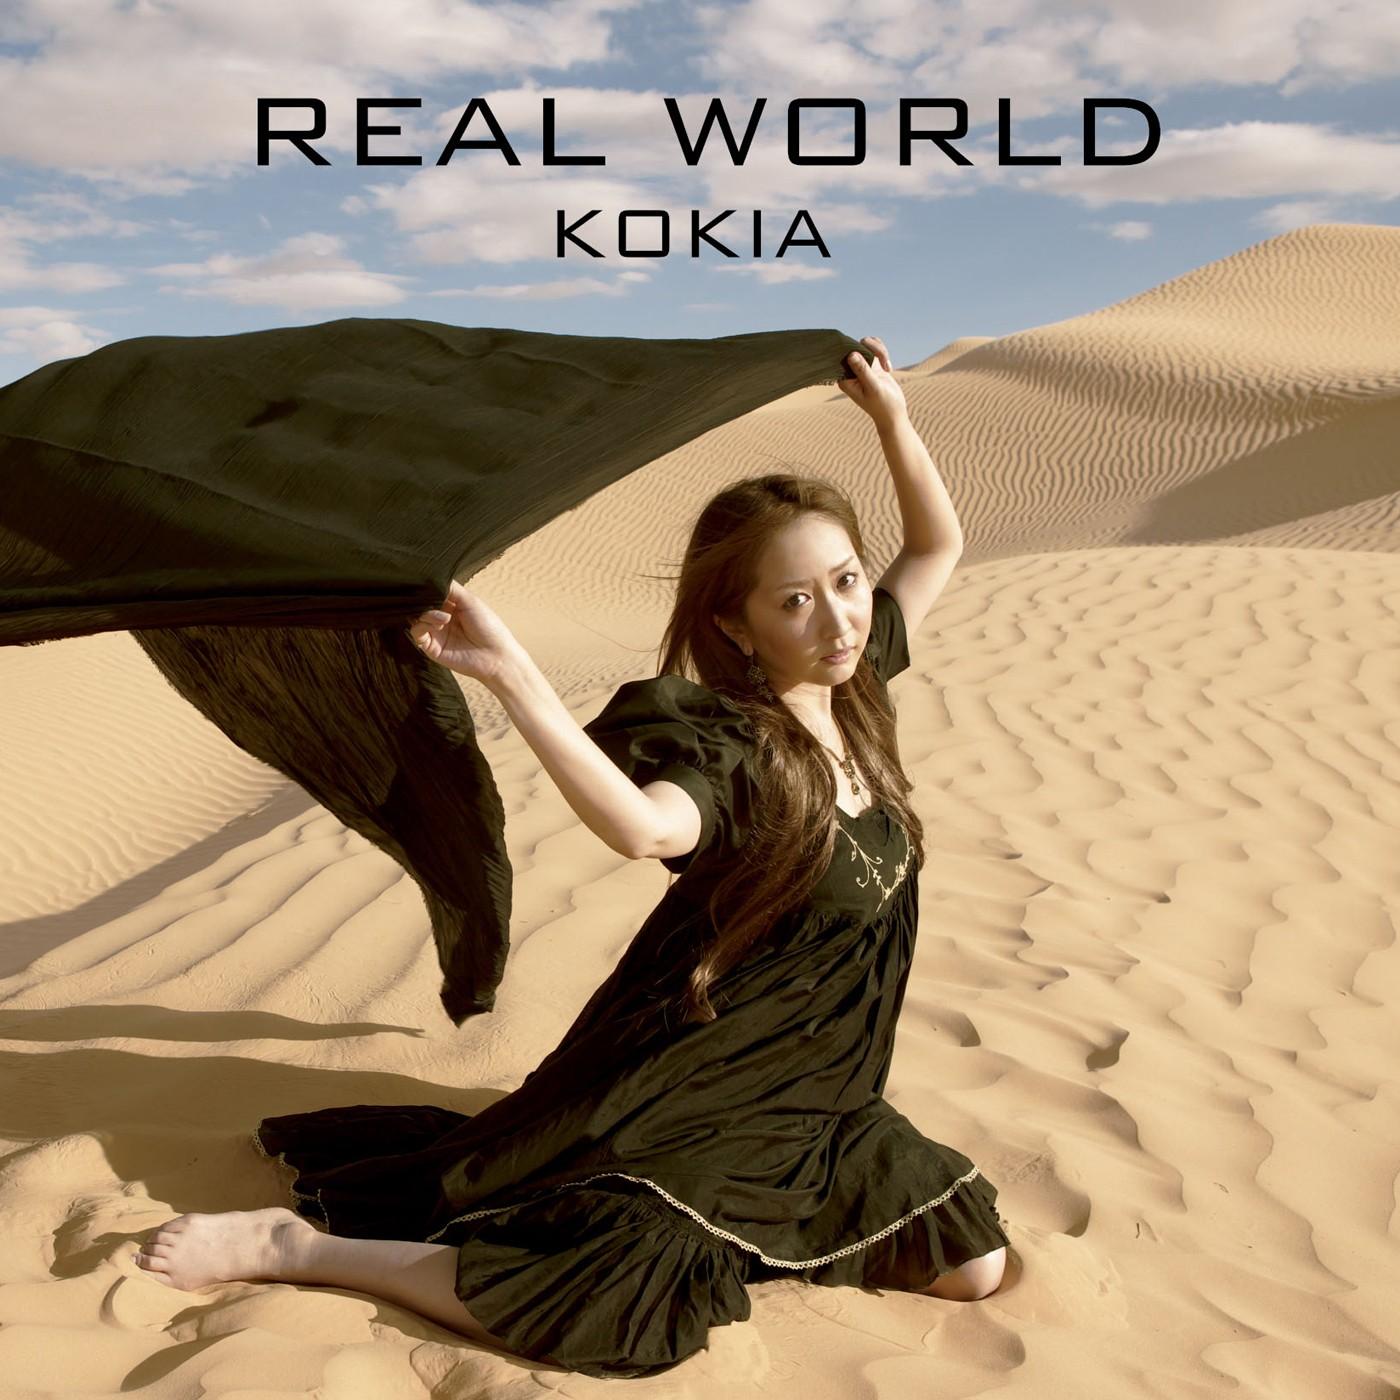 KOKIA – Real World [FLAC / 24bit Lossless / WEB] [2010.03.31]